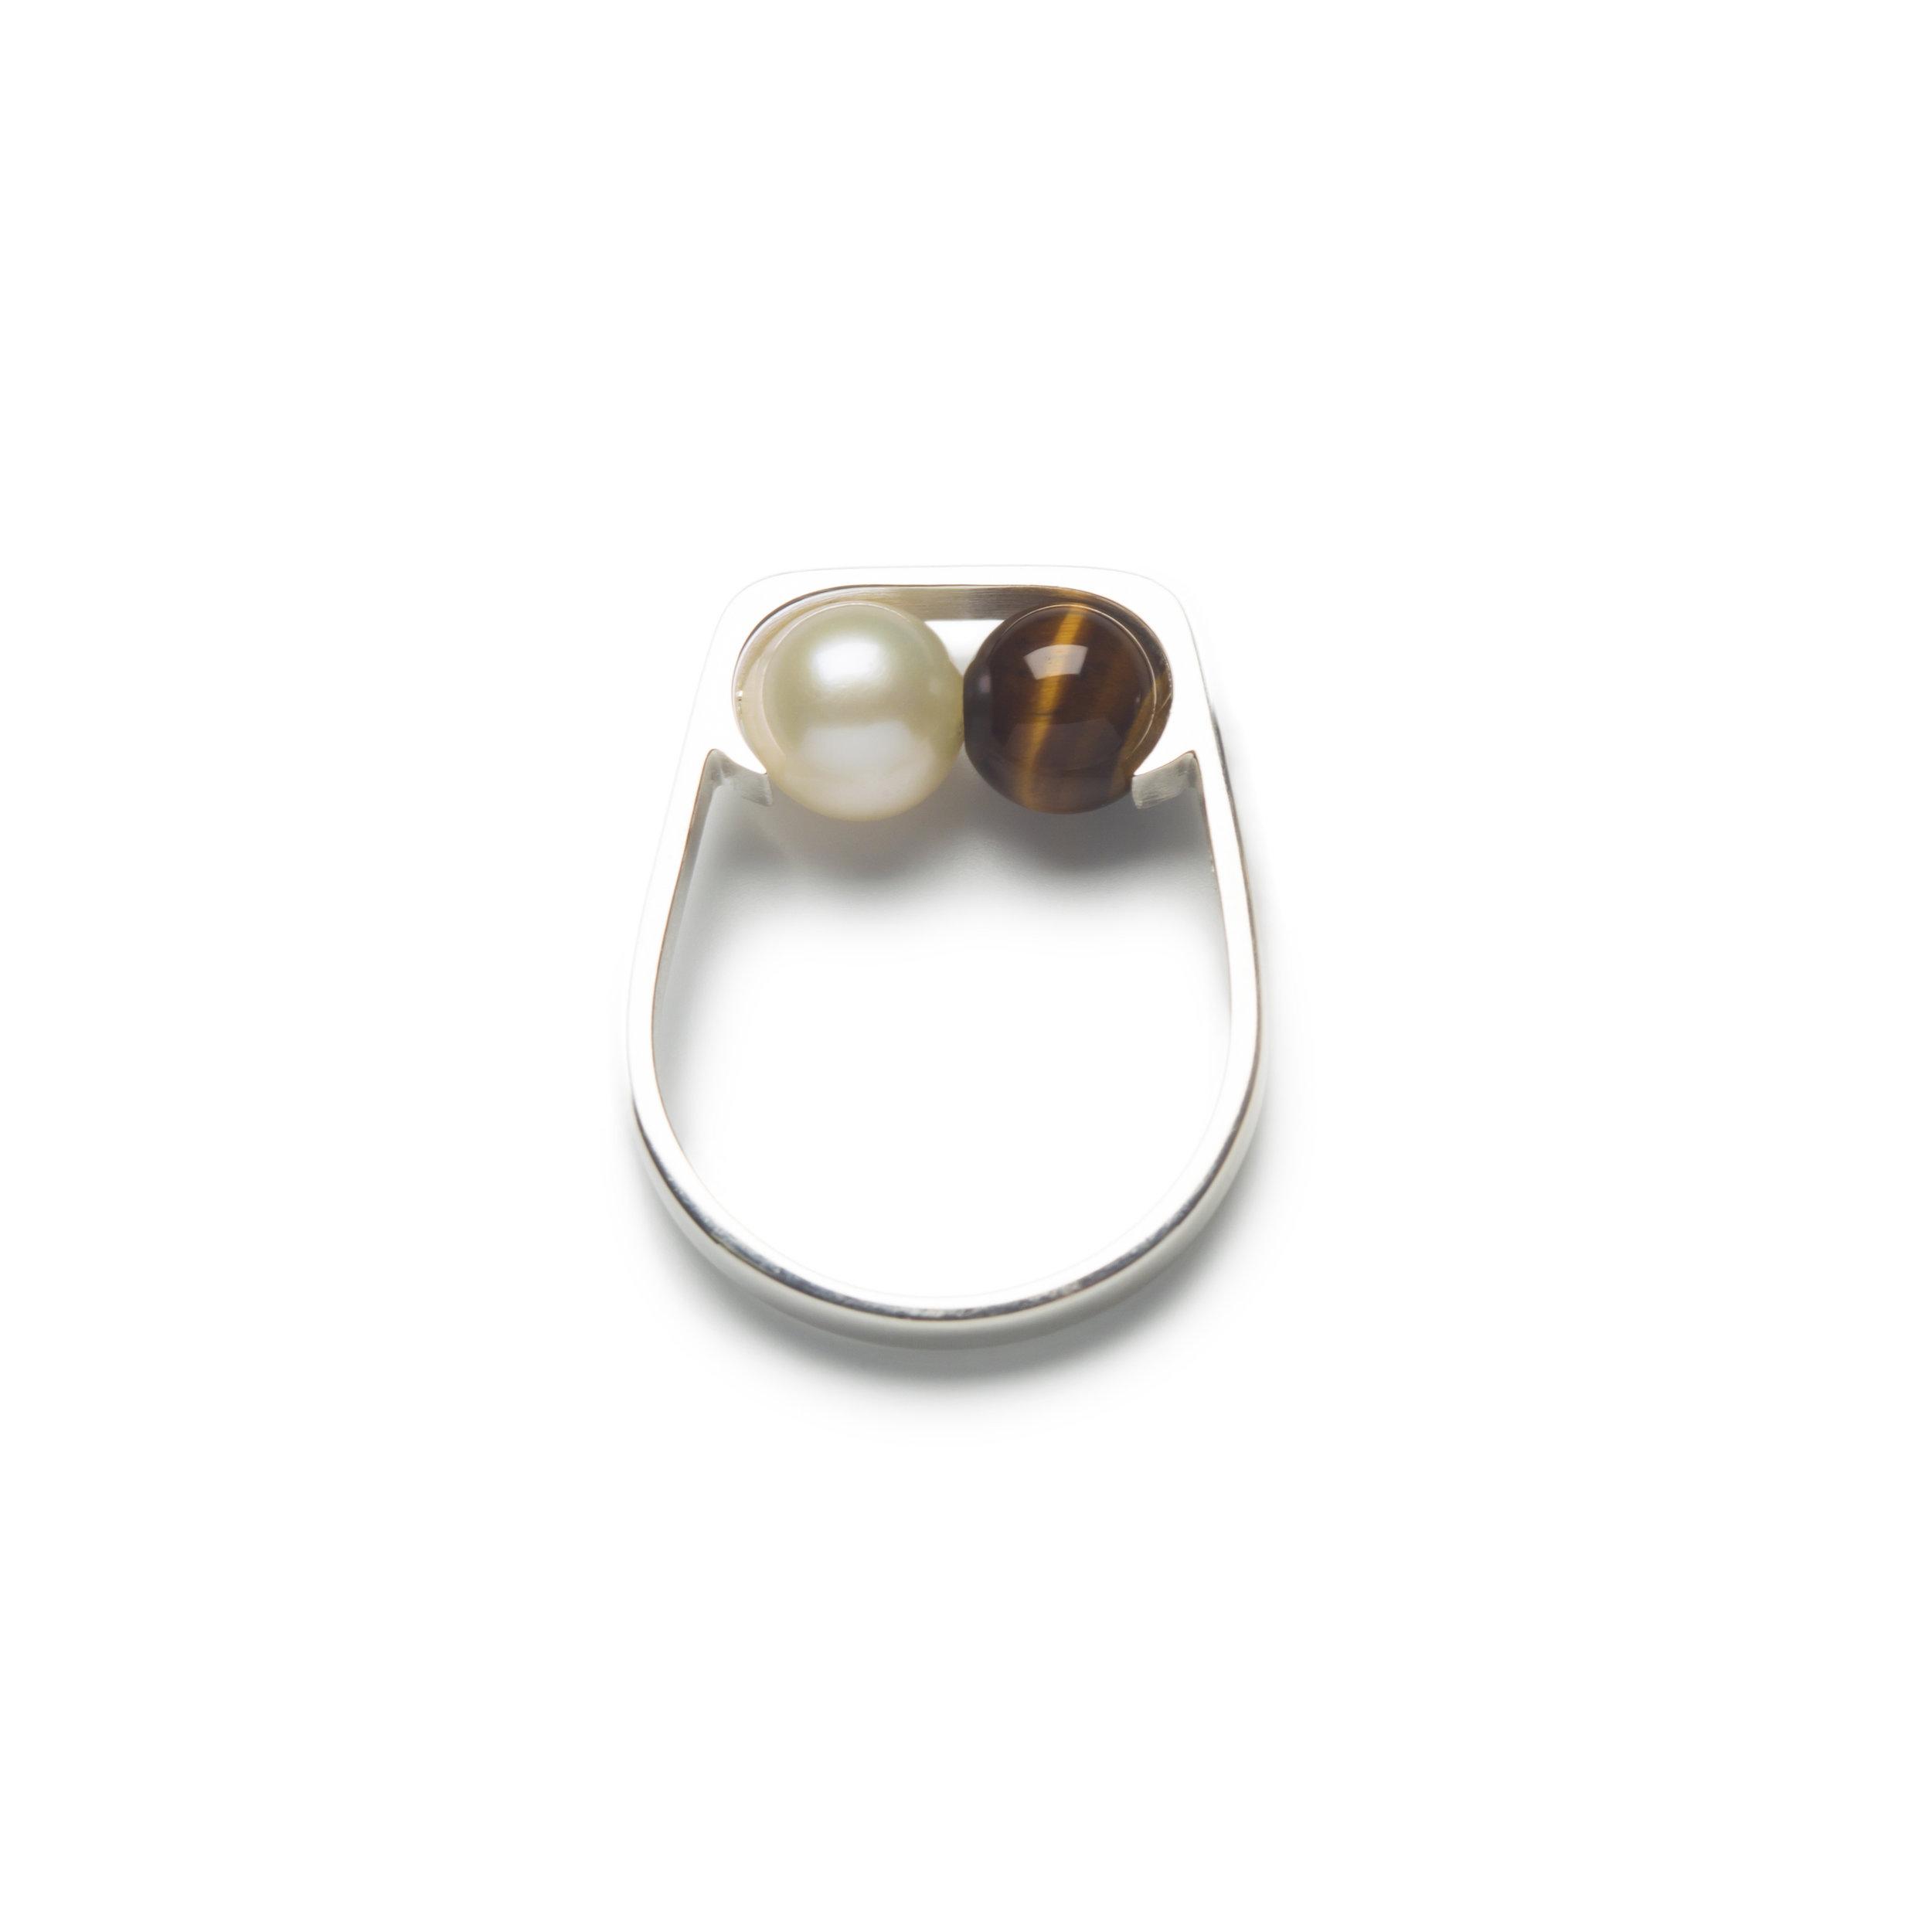 Lana_ring_w_2_stones_tigers_eye_pearl_silver.jpg